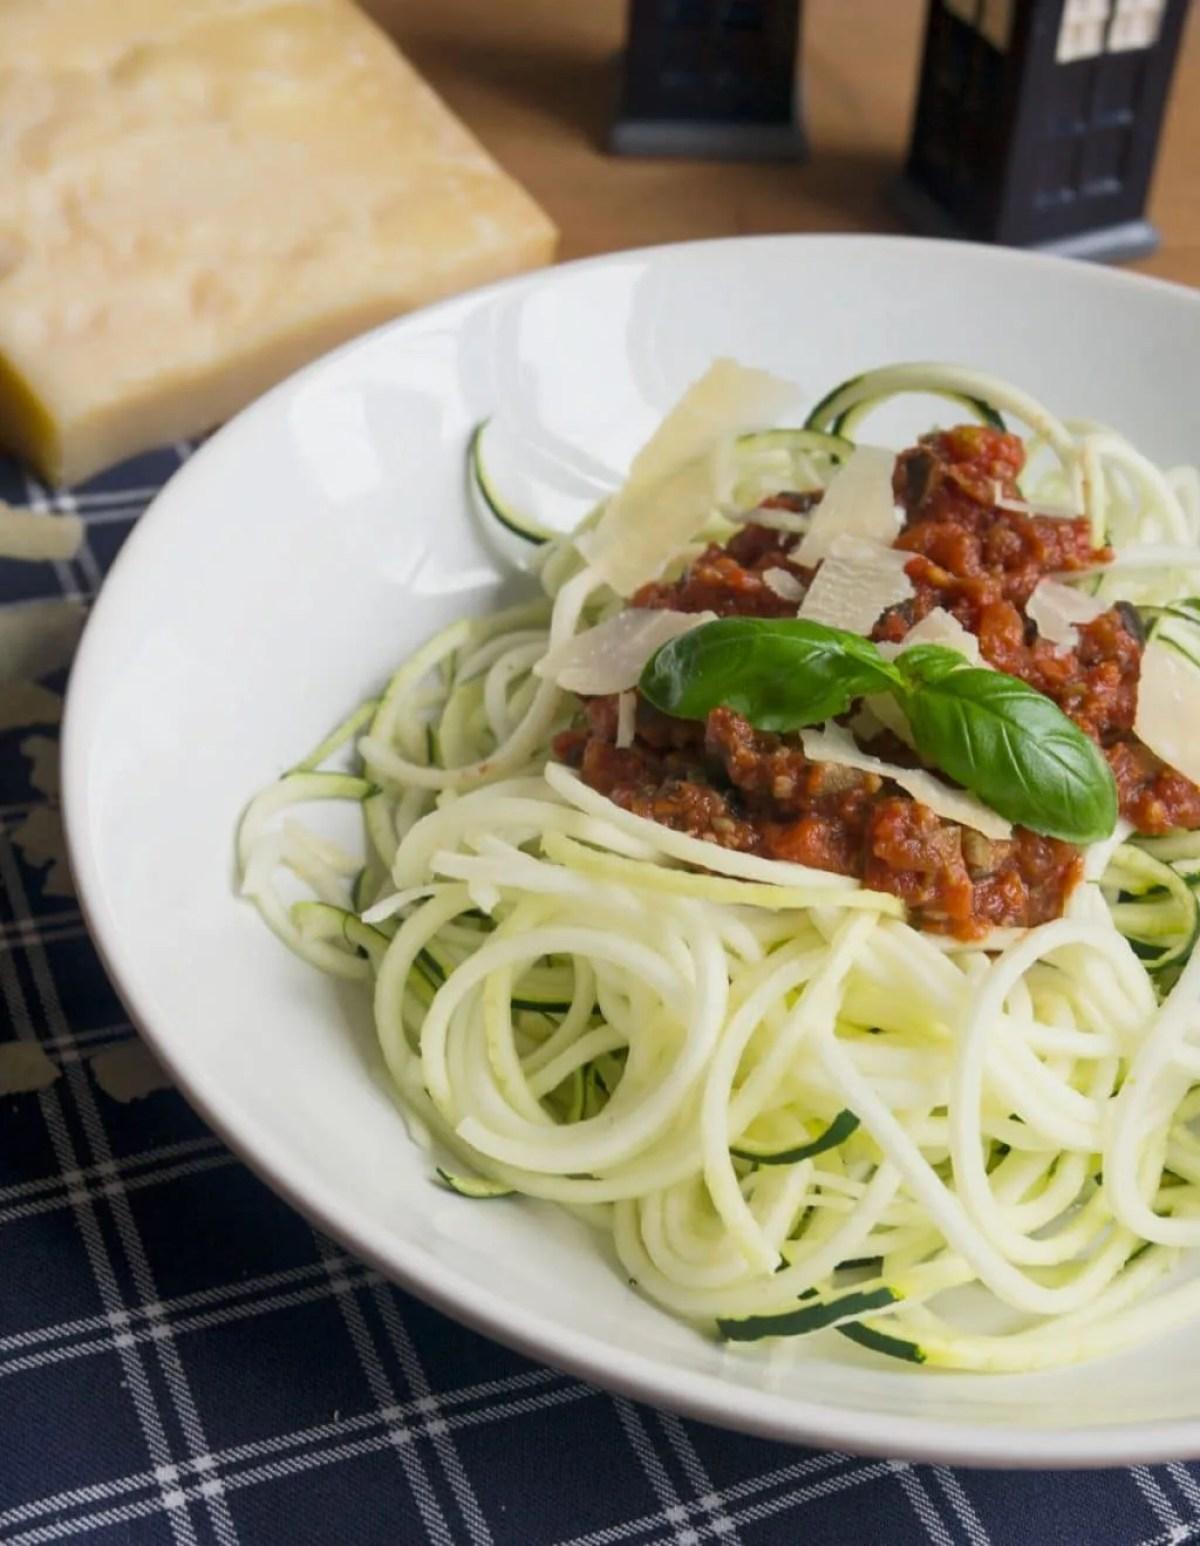 Zoodles a la Puttanesca - würzig, kräftige Sauce mit Zucchini Nudeln, super lecker!